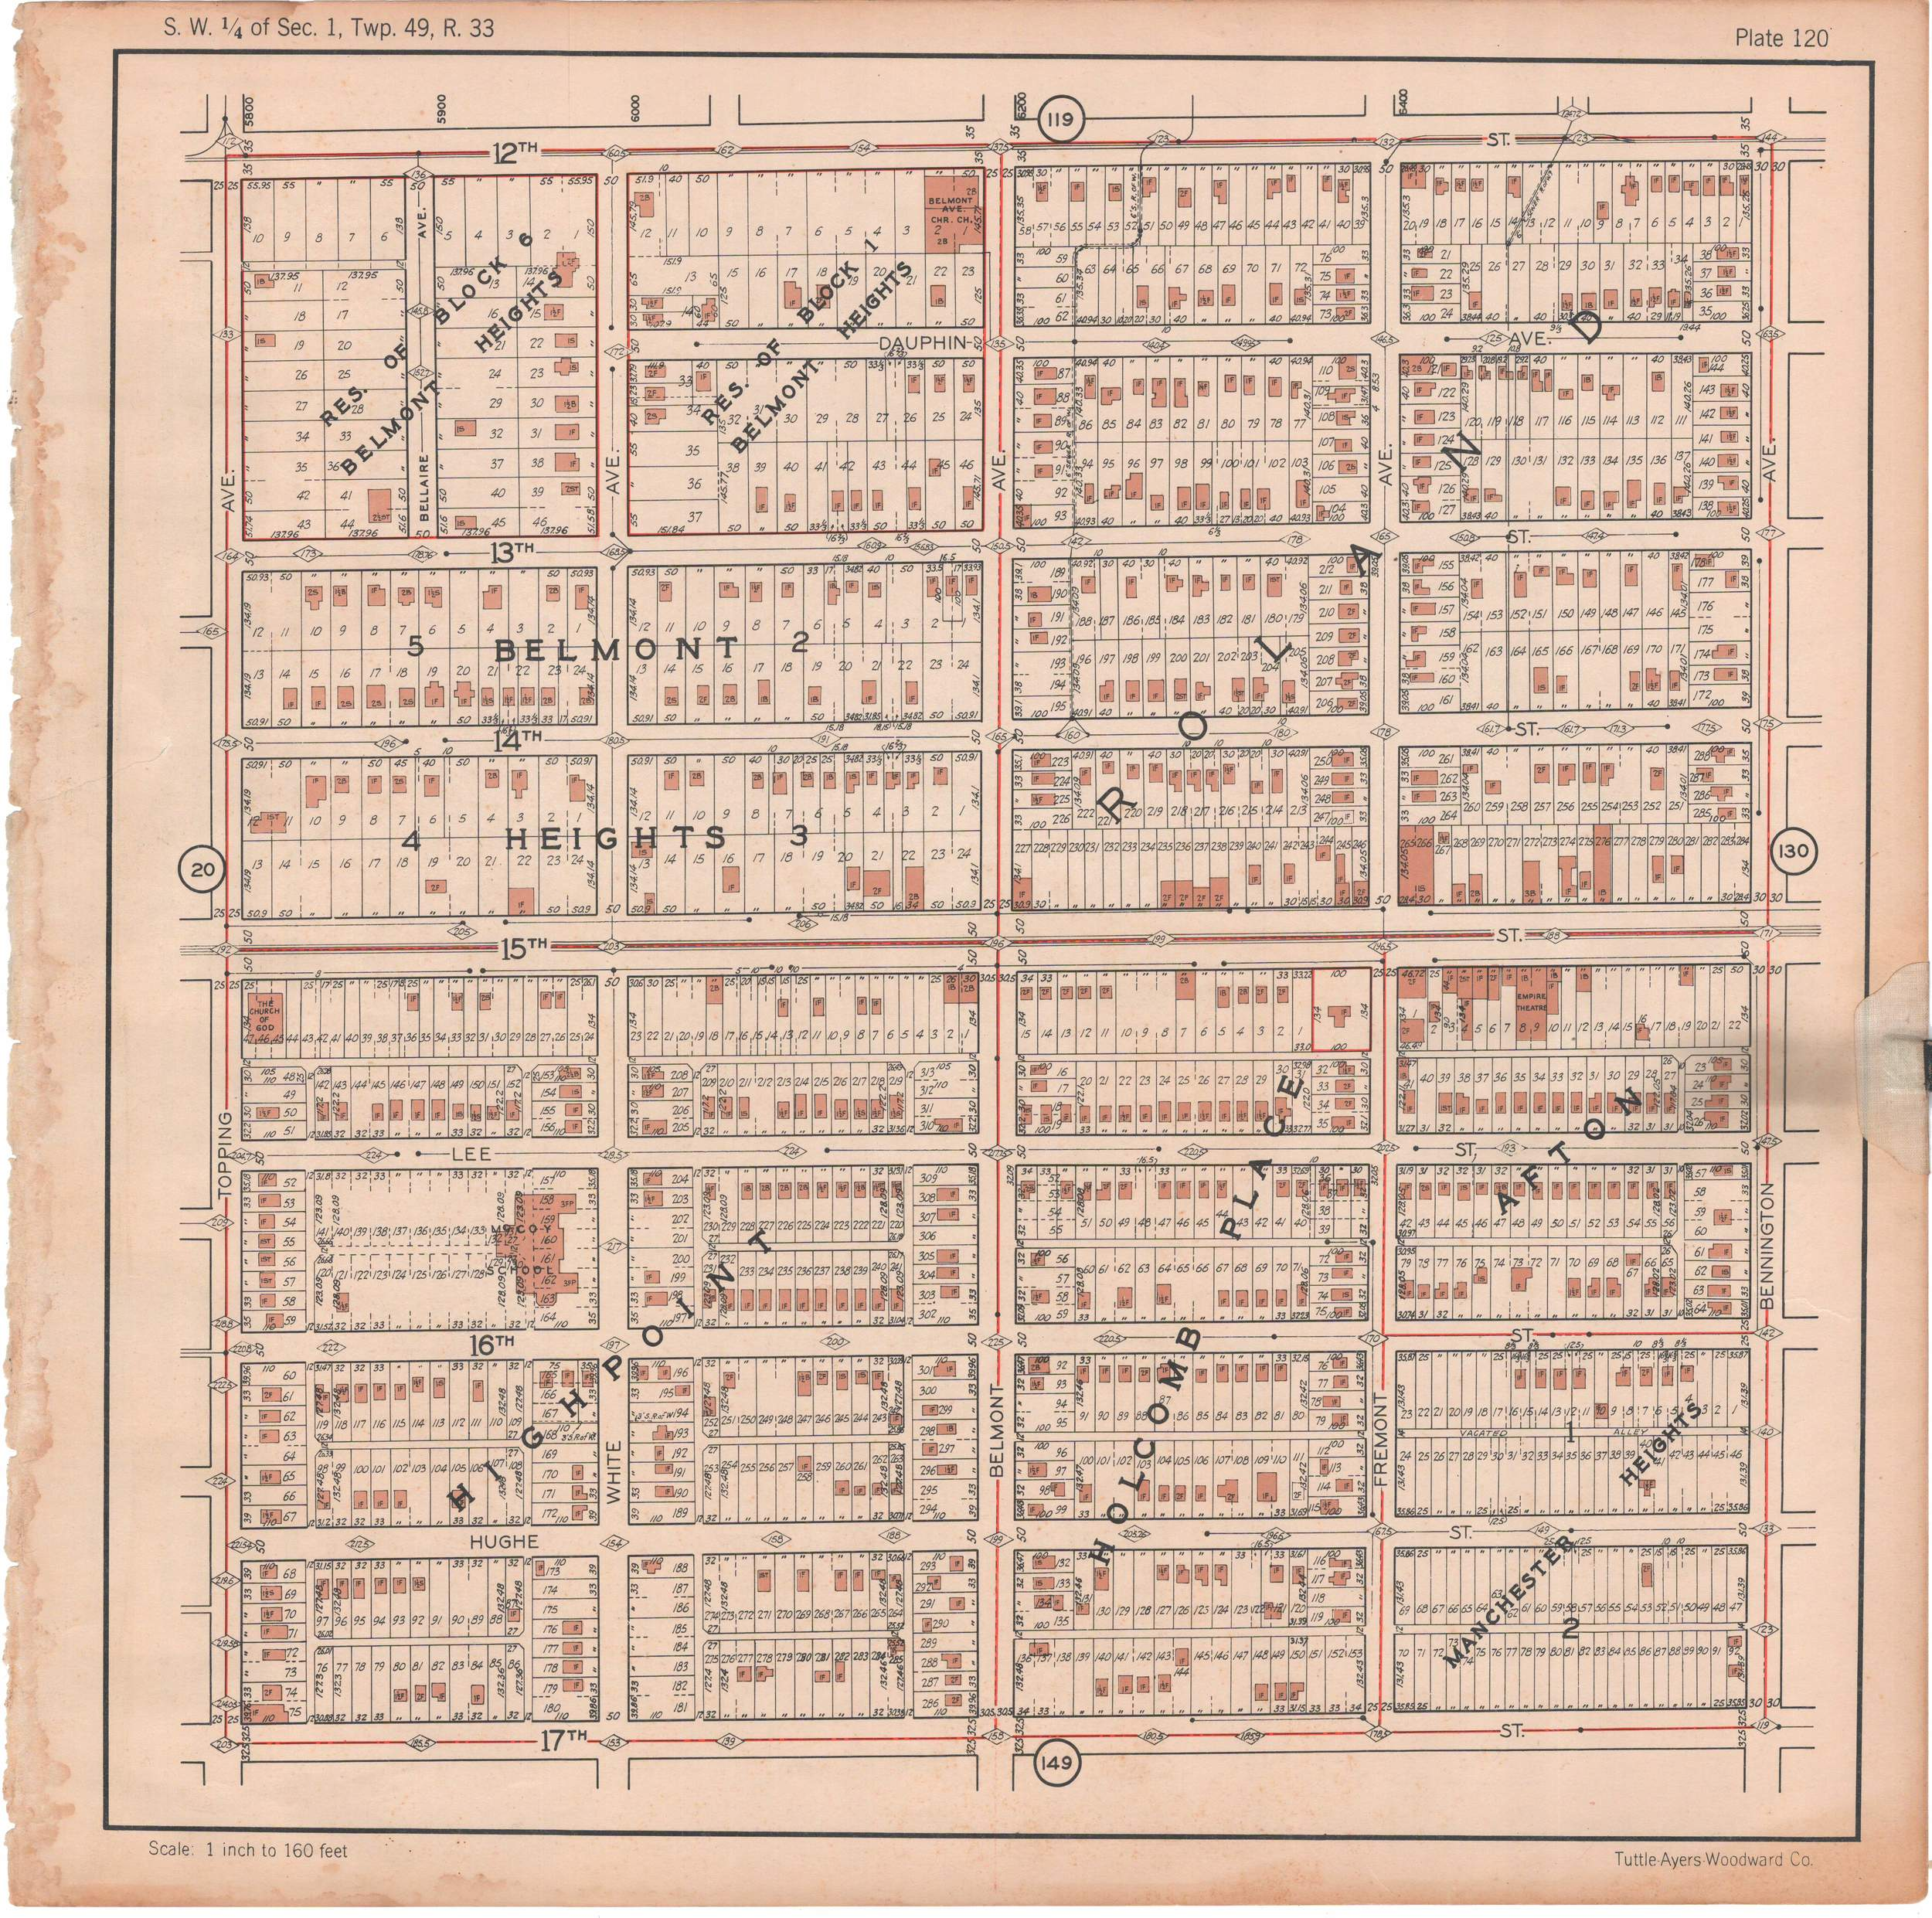 1925 TUTTLE_AYERS_Plate 120.JPG